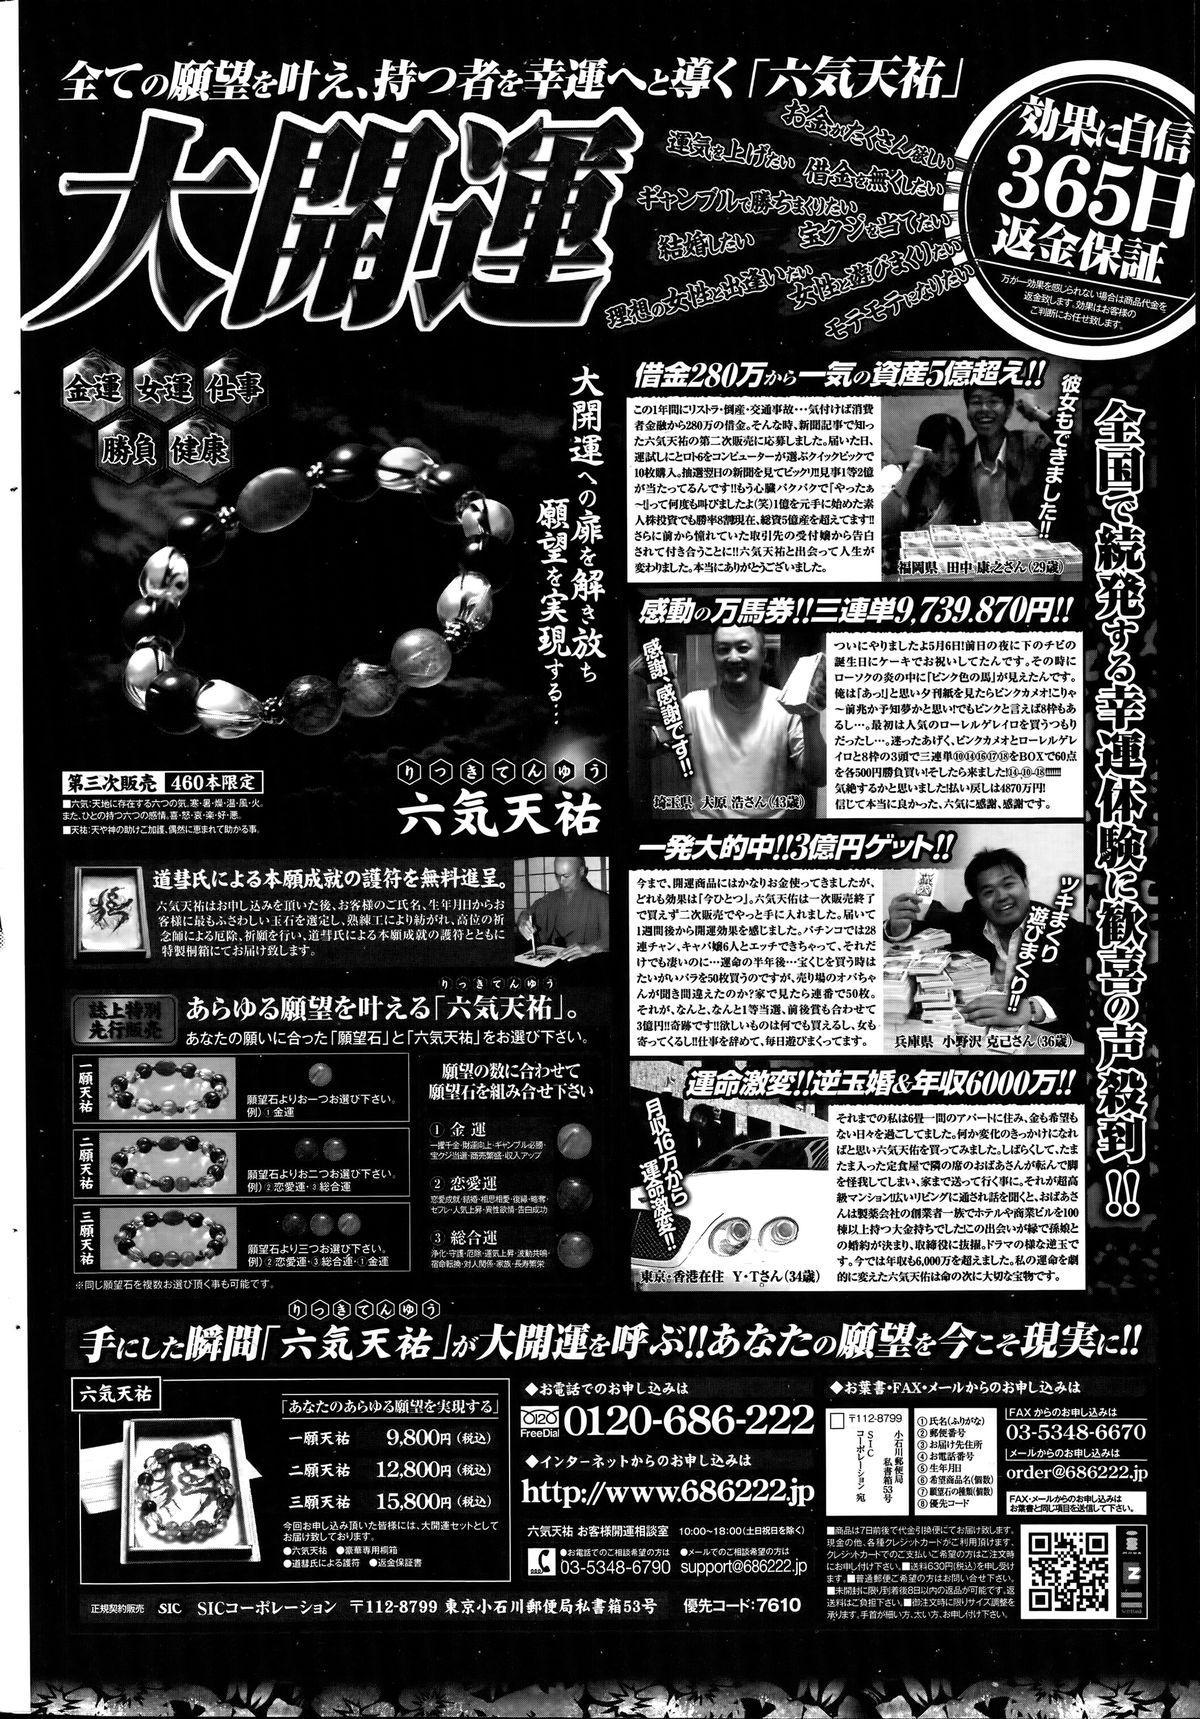 COMIC Penguin Club Sanzokuban 2014-06 231